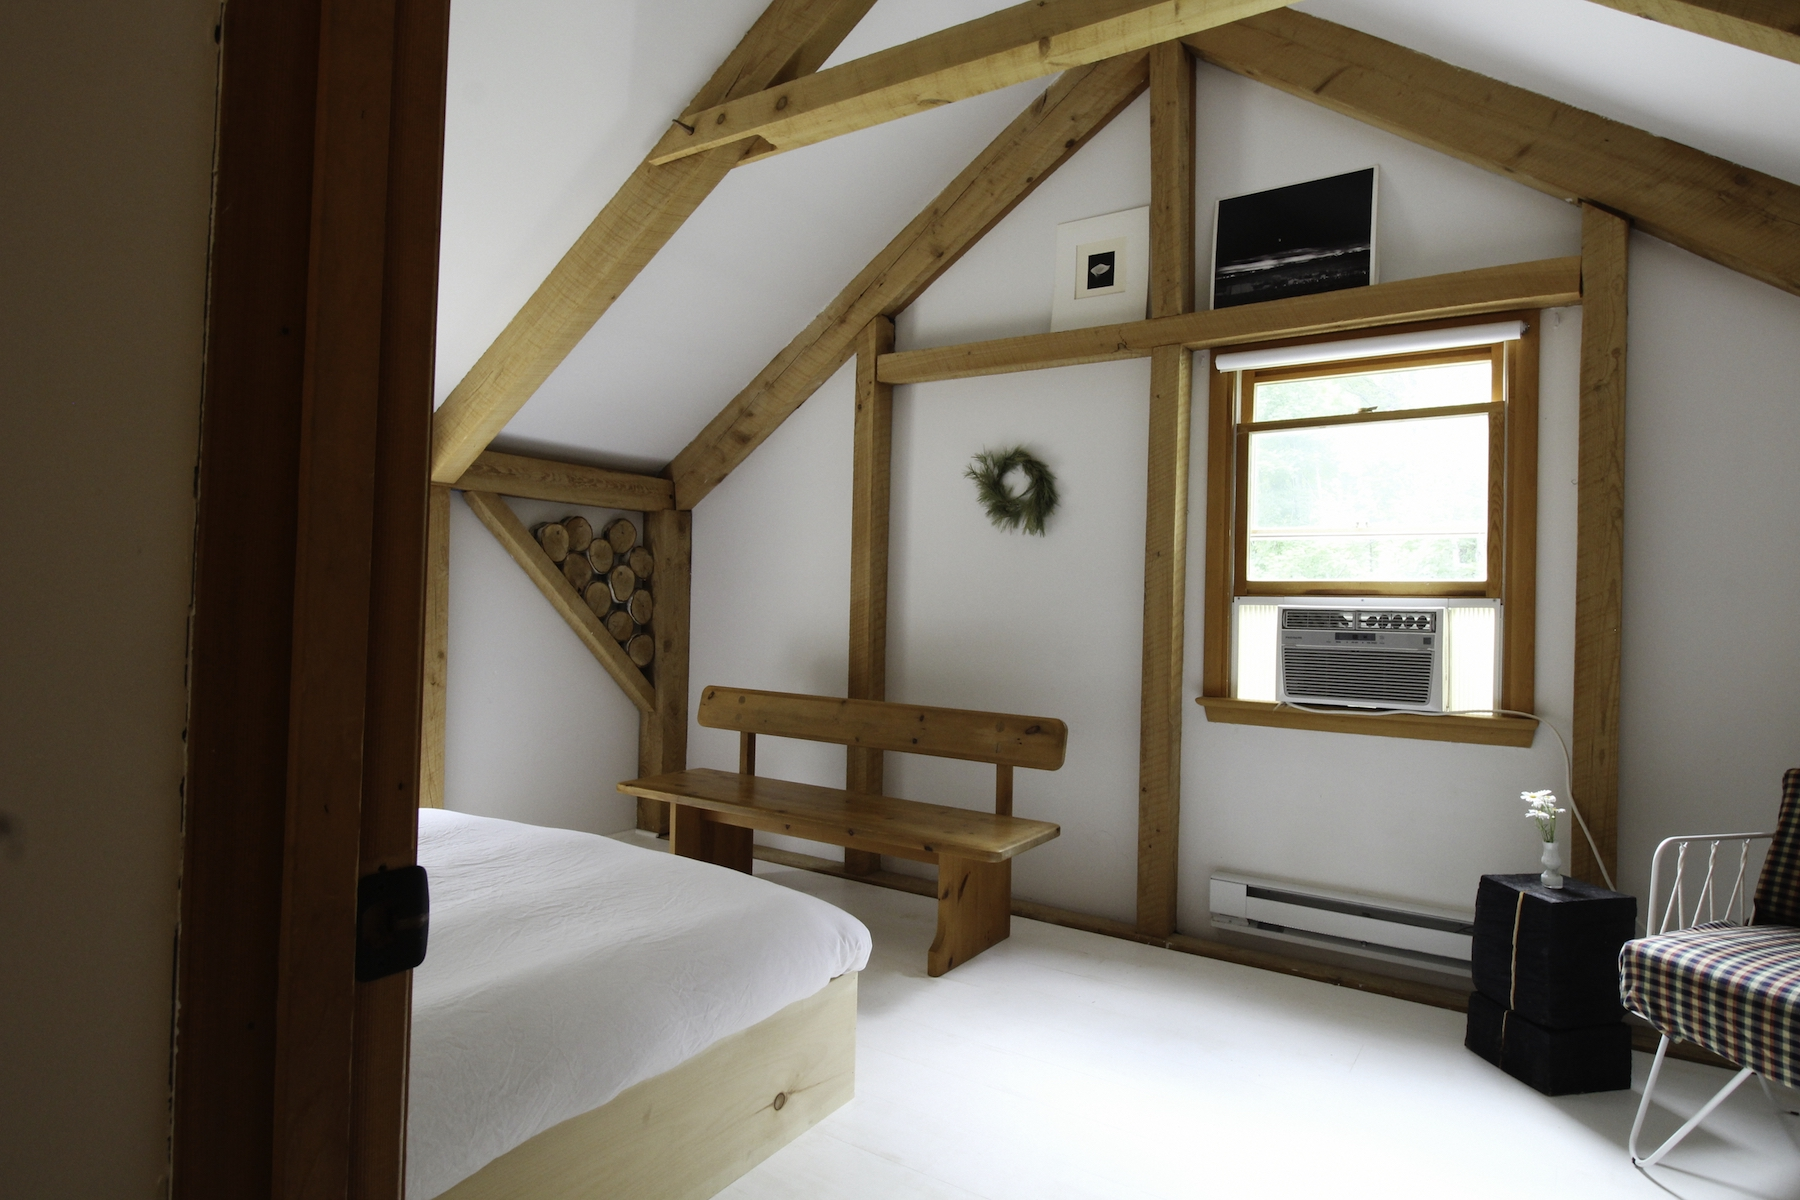 GROGKILL BEDROOM TWO ENTERING.jpg